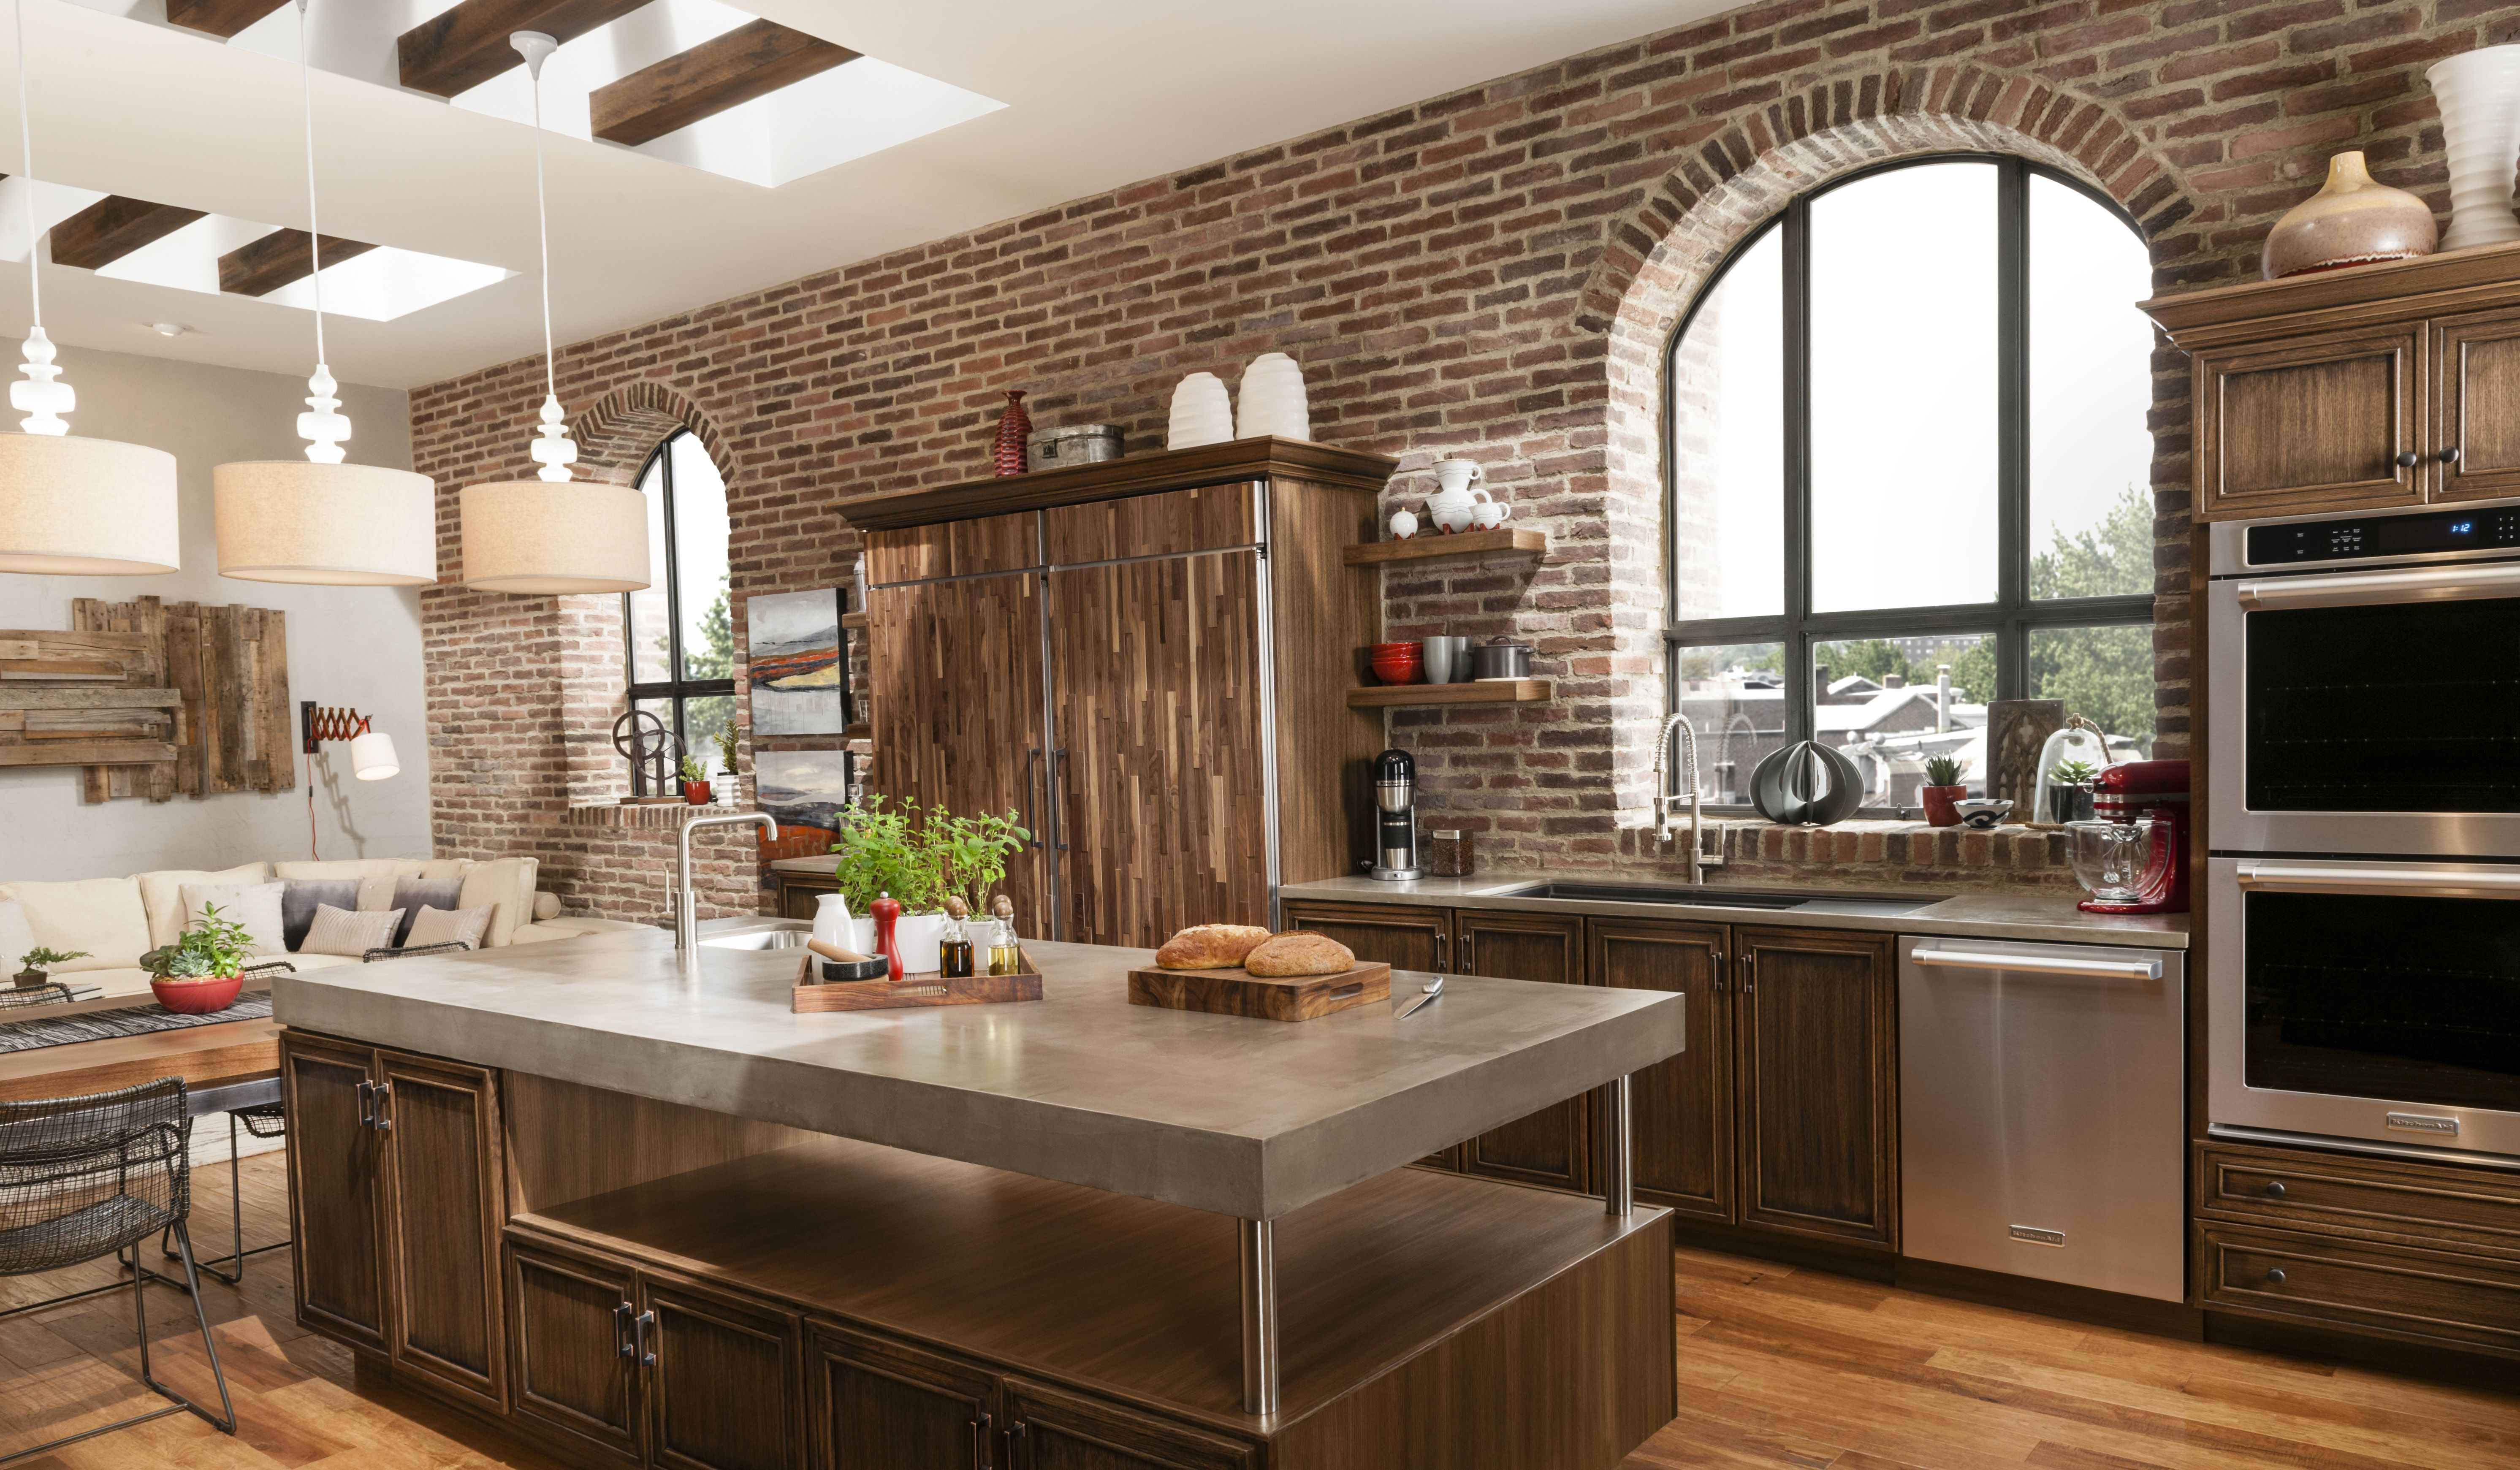 Eldorado stone romabrick accent wall with a modern kitchen for Eldorado stone kitchen